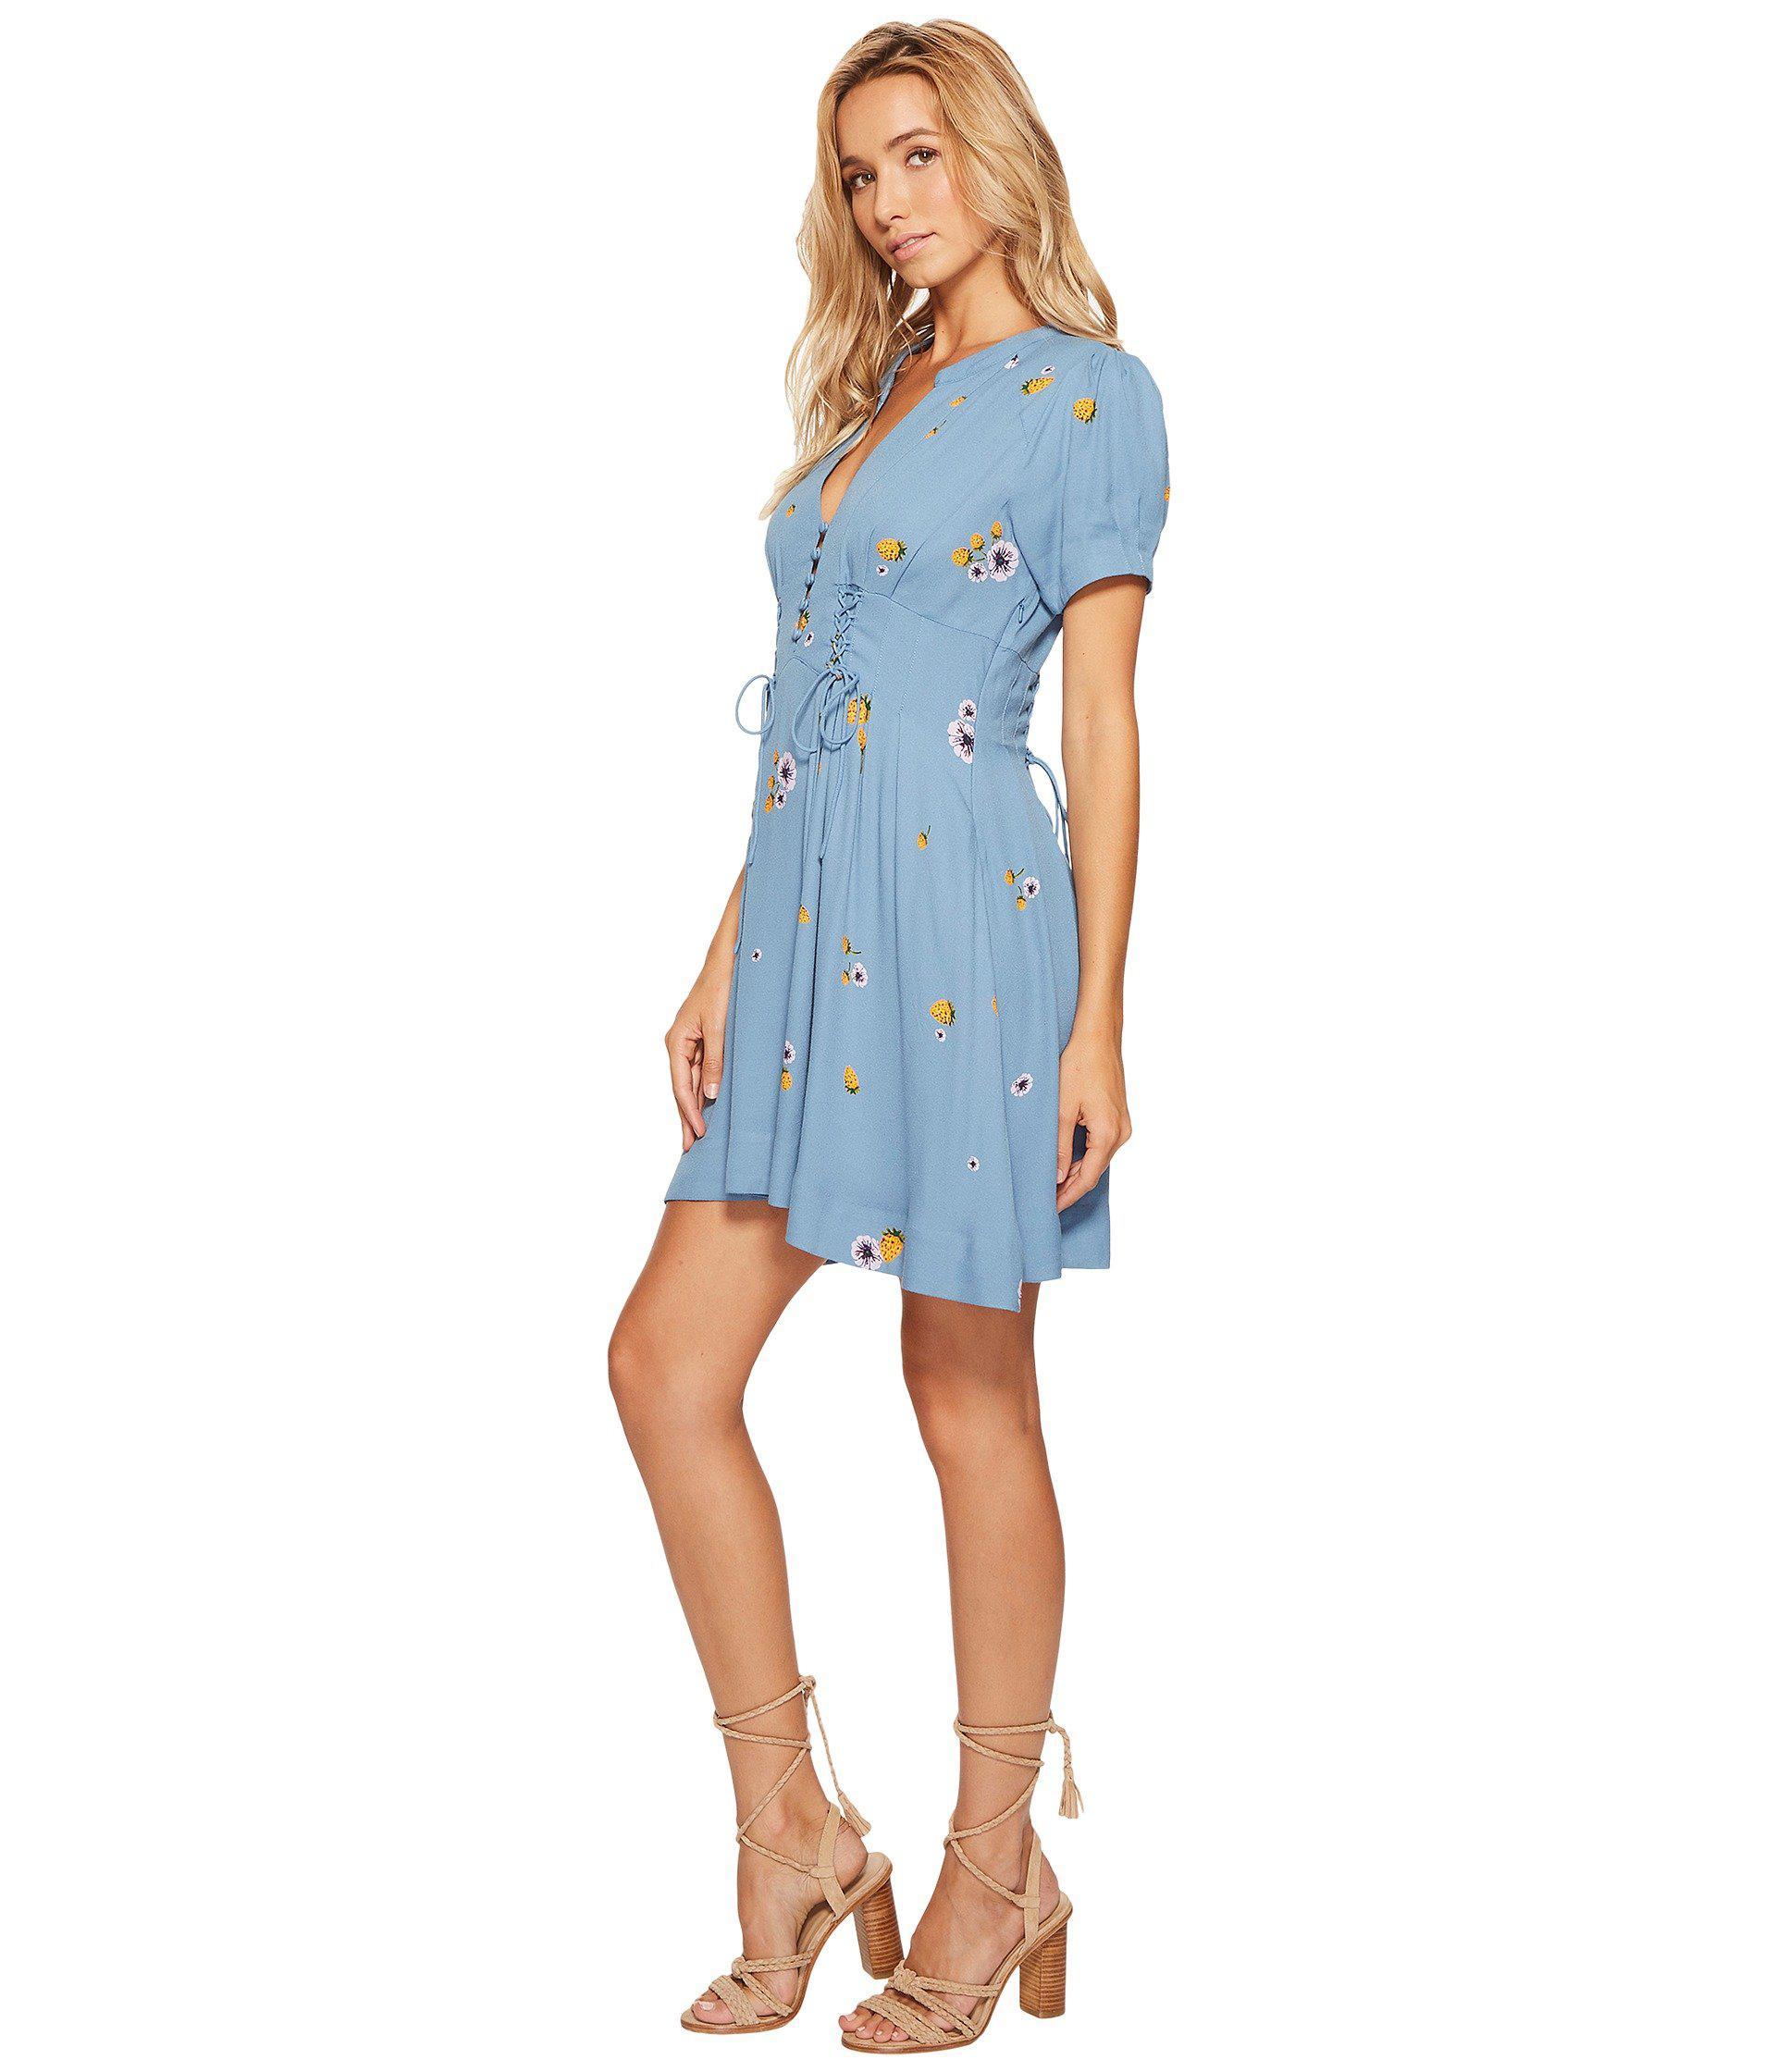 b22e8f43948e Free People Dream Girl Mini Dress in Blue - Lyst